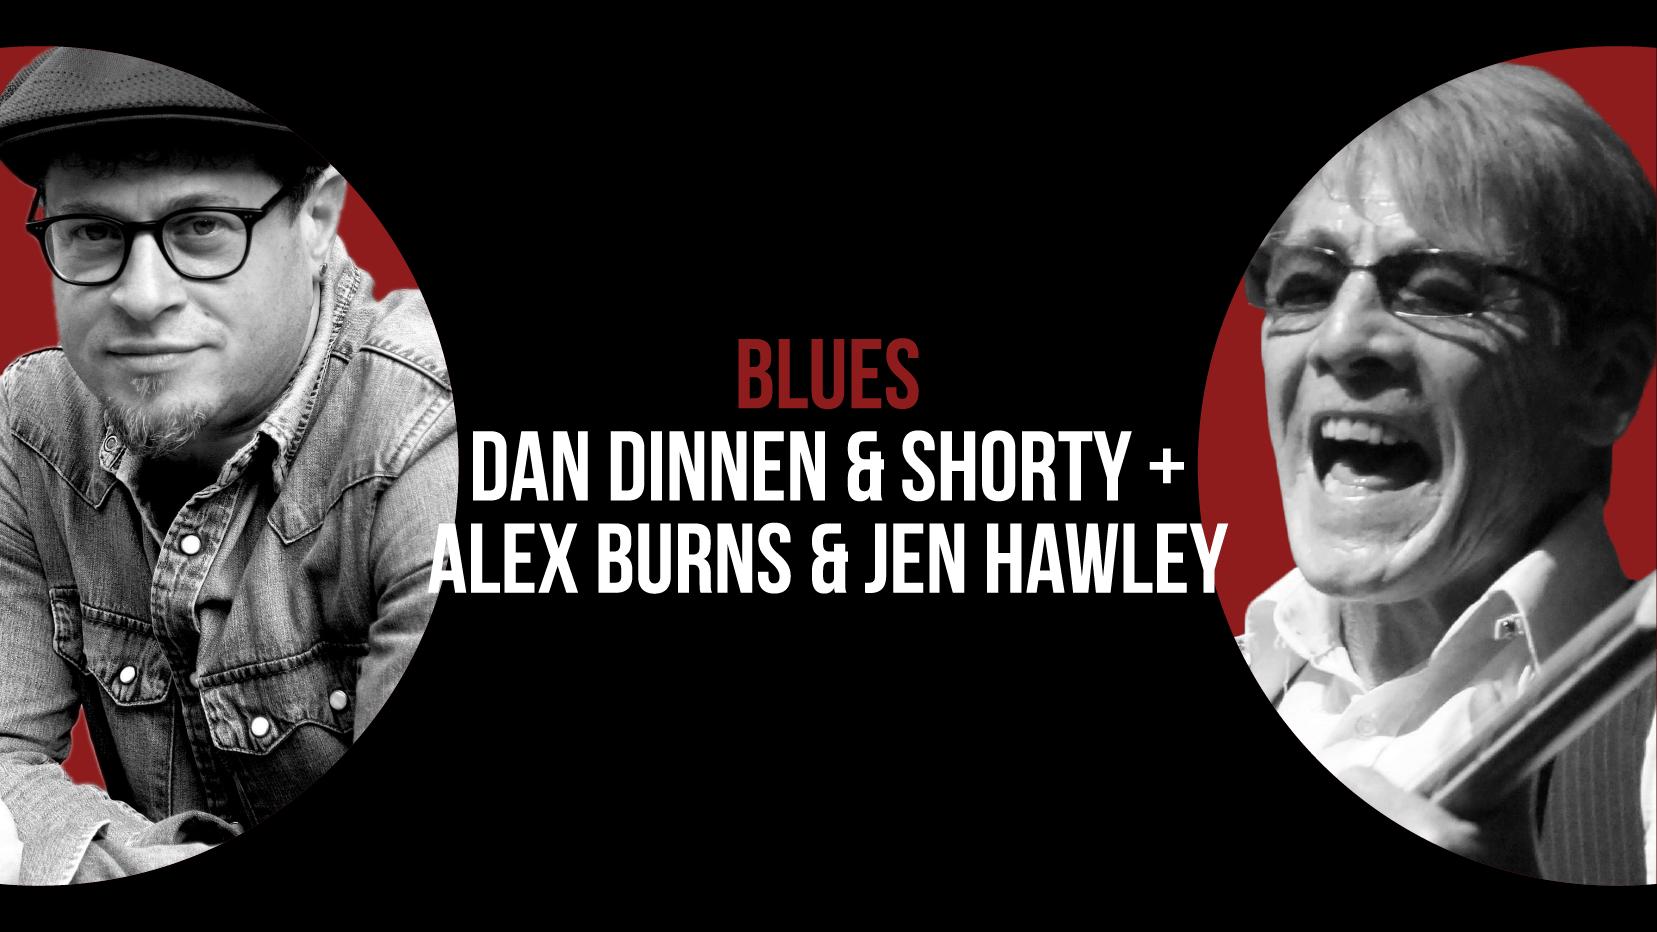 Dan Dinnen and Alex Burns